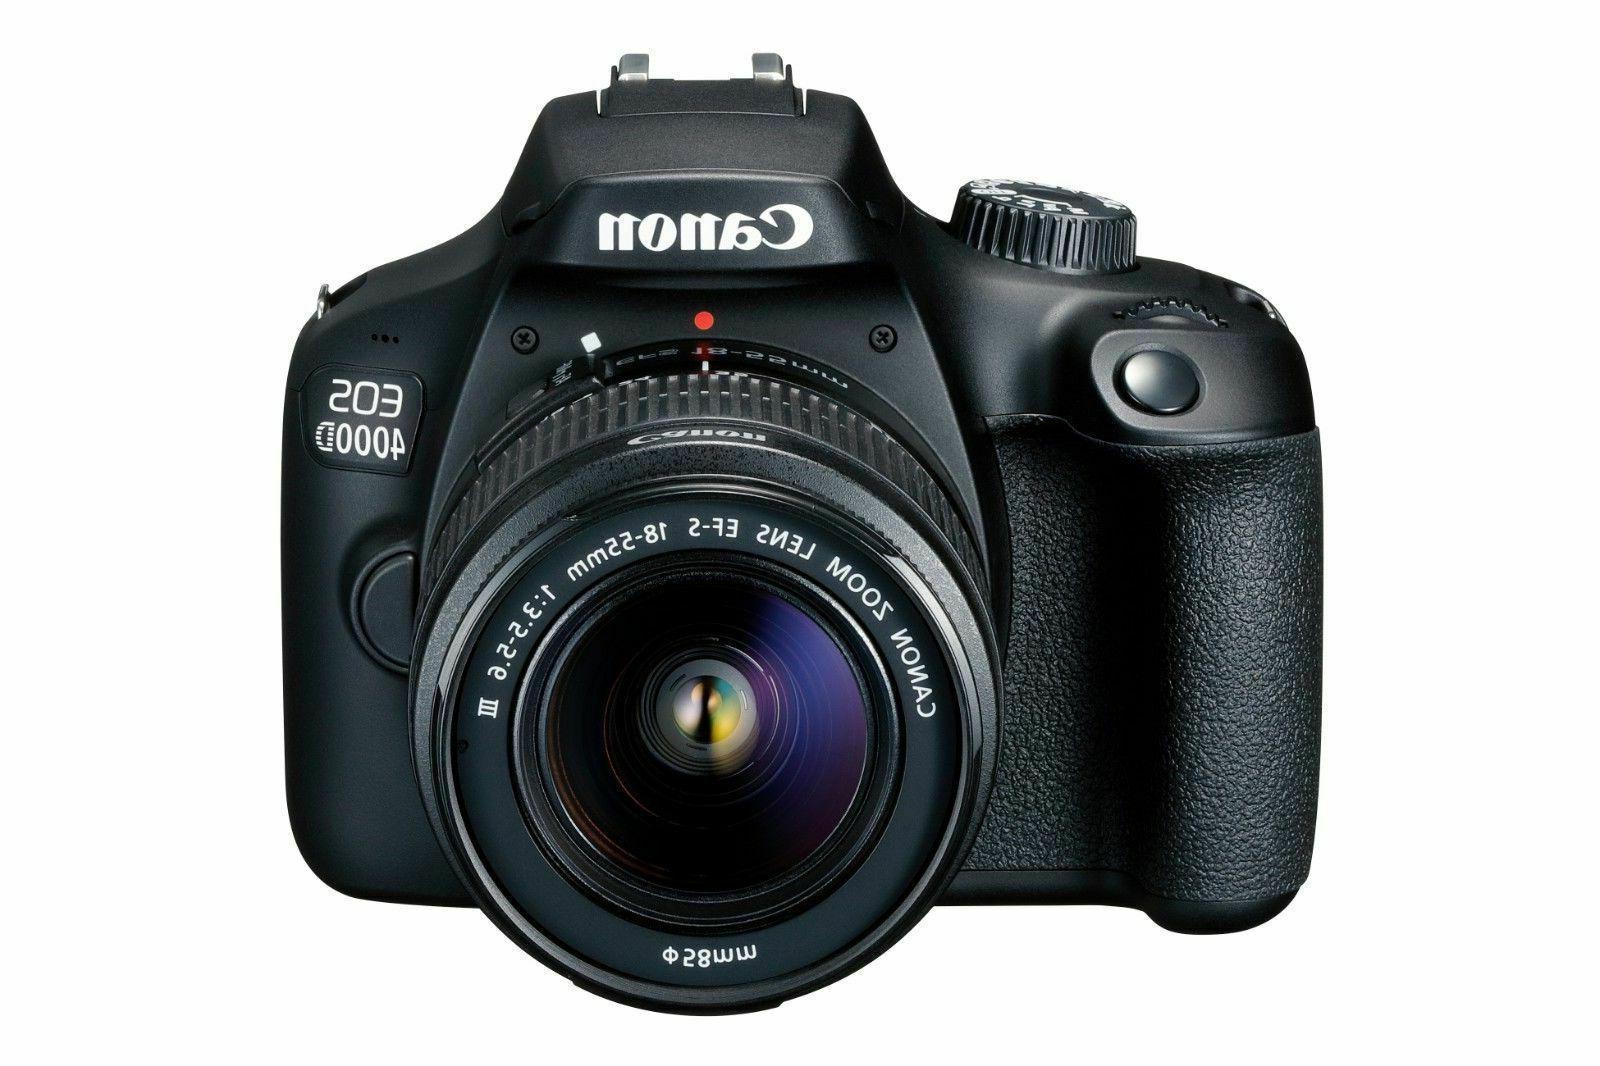 Canon 4000D Camera f/3.5-5.6 III